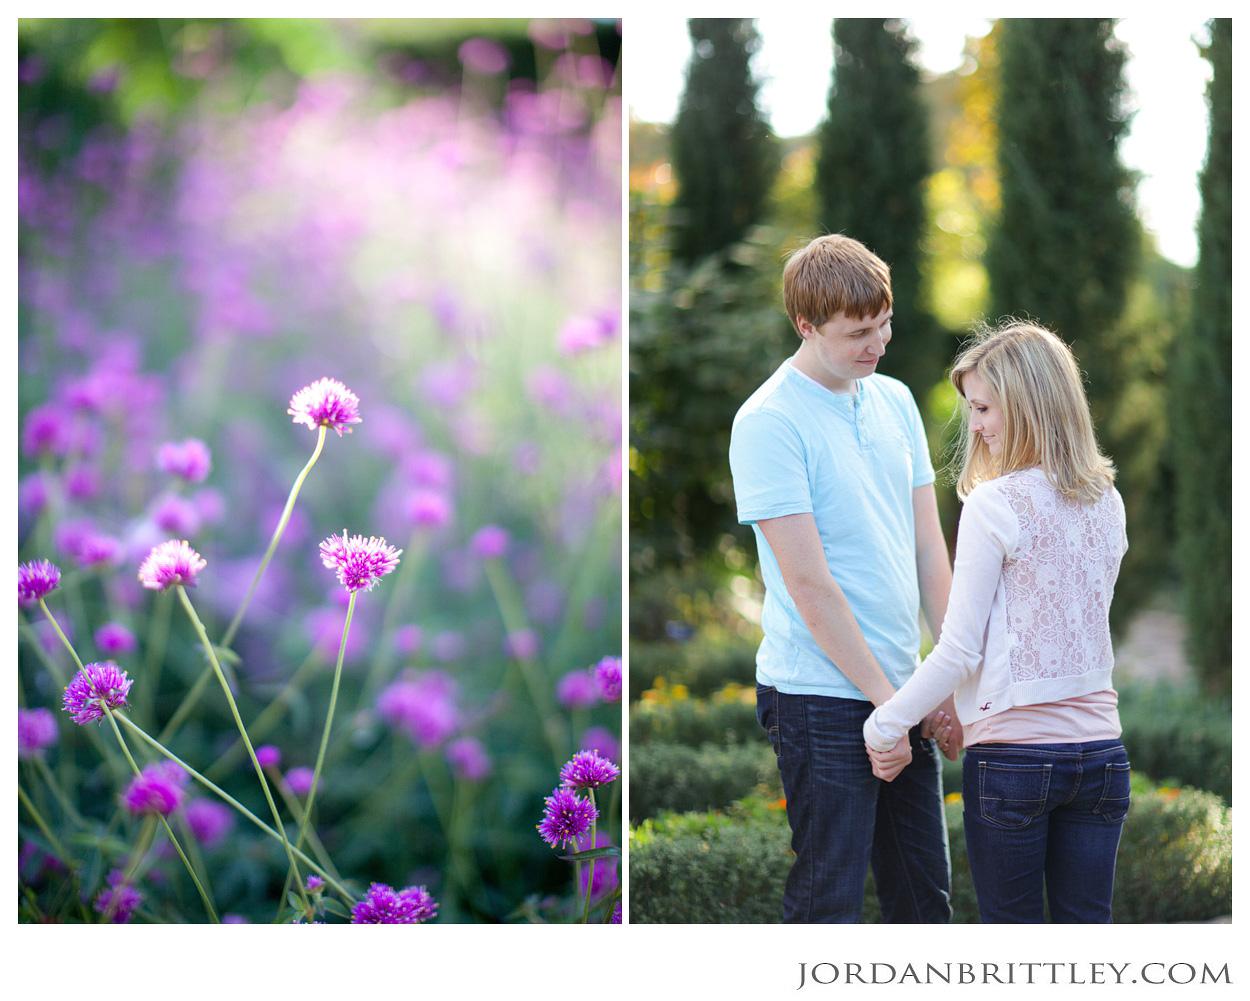 St Louis Engagement, Botanical Garden Engagement, Missouri Engagement, Missouri Botanical Garden Engagement,